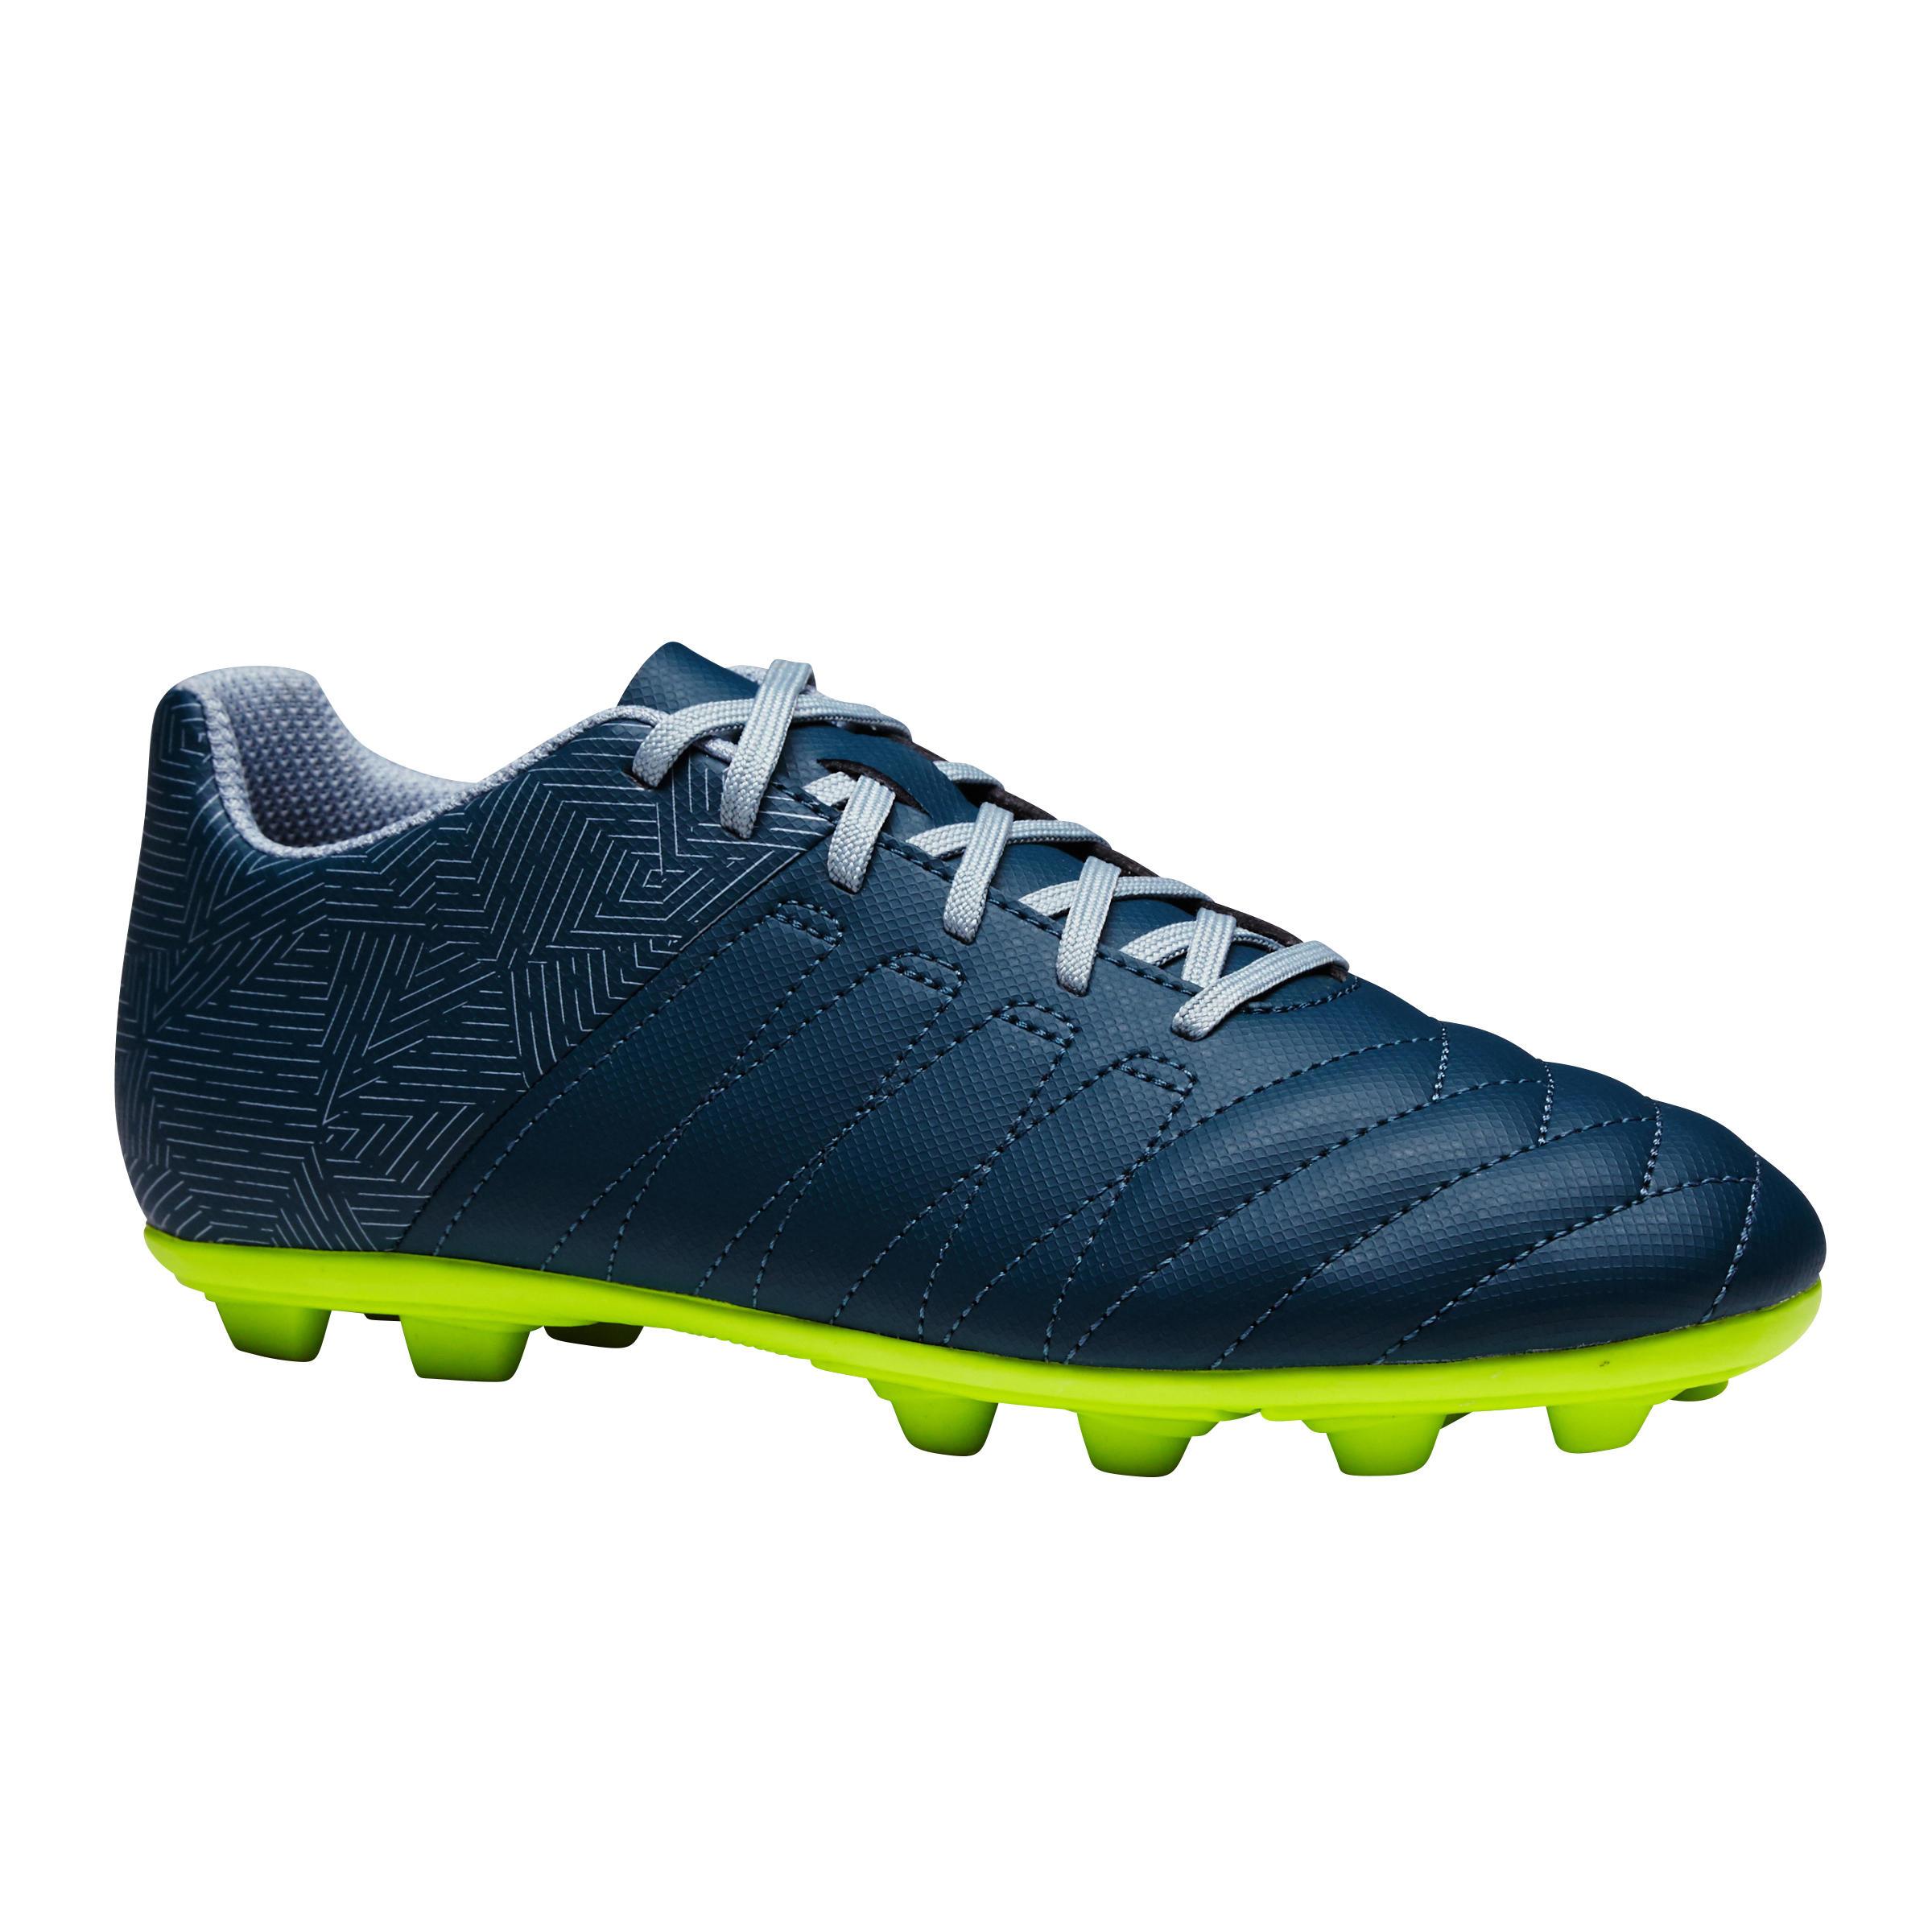 high fashion promo codes low price Chaussures de Football pas cher: Kipsta, Nike, Adidas, Puma ...